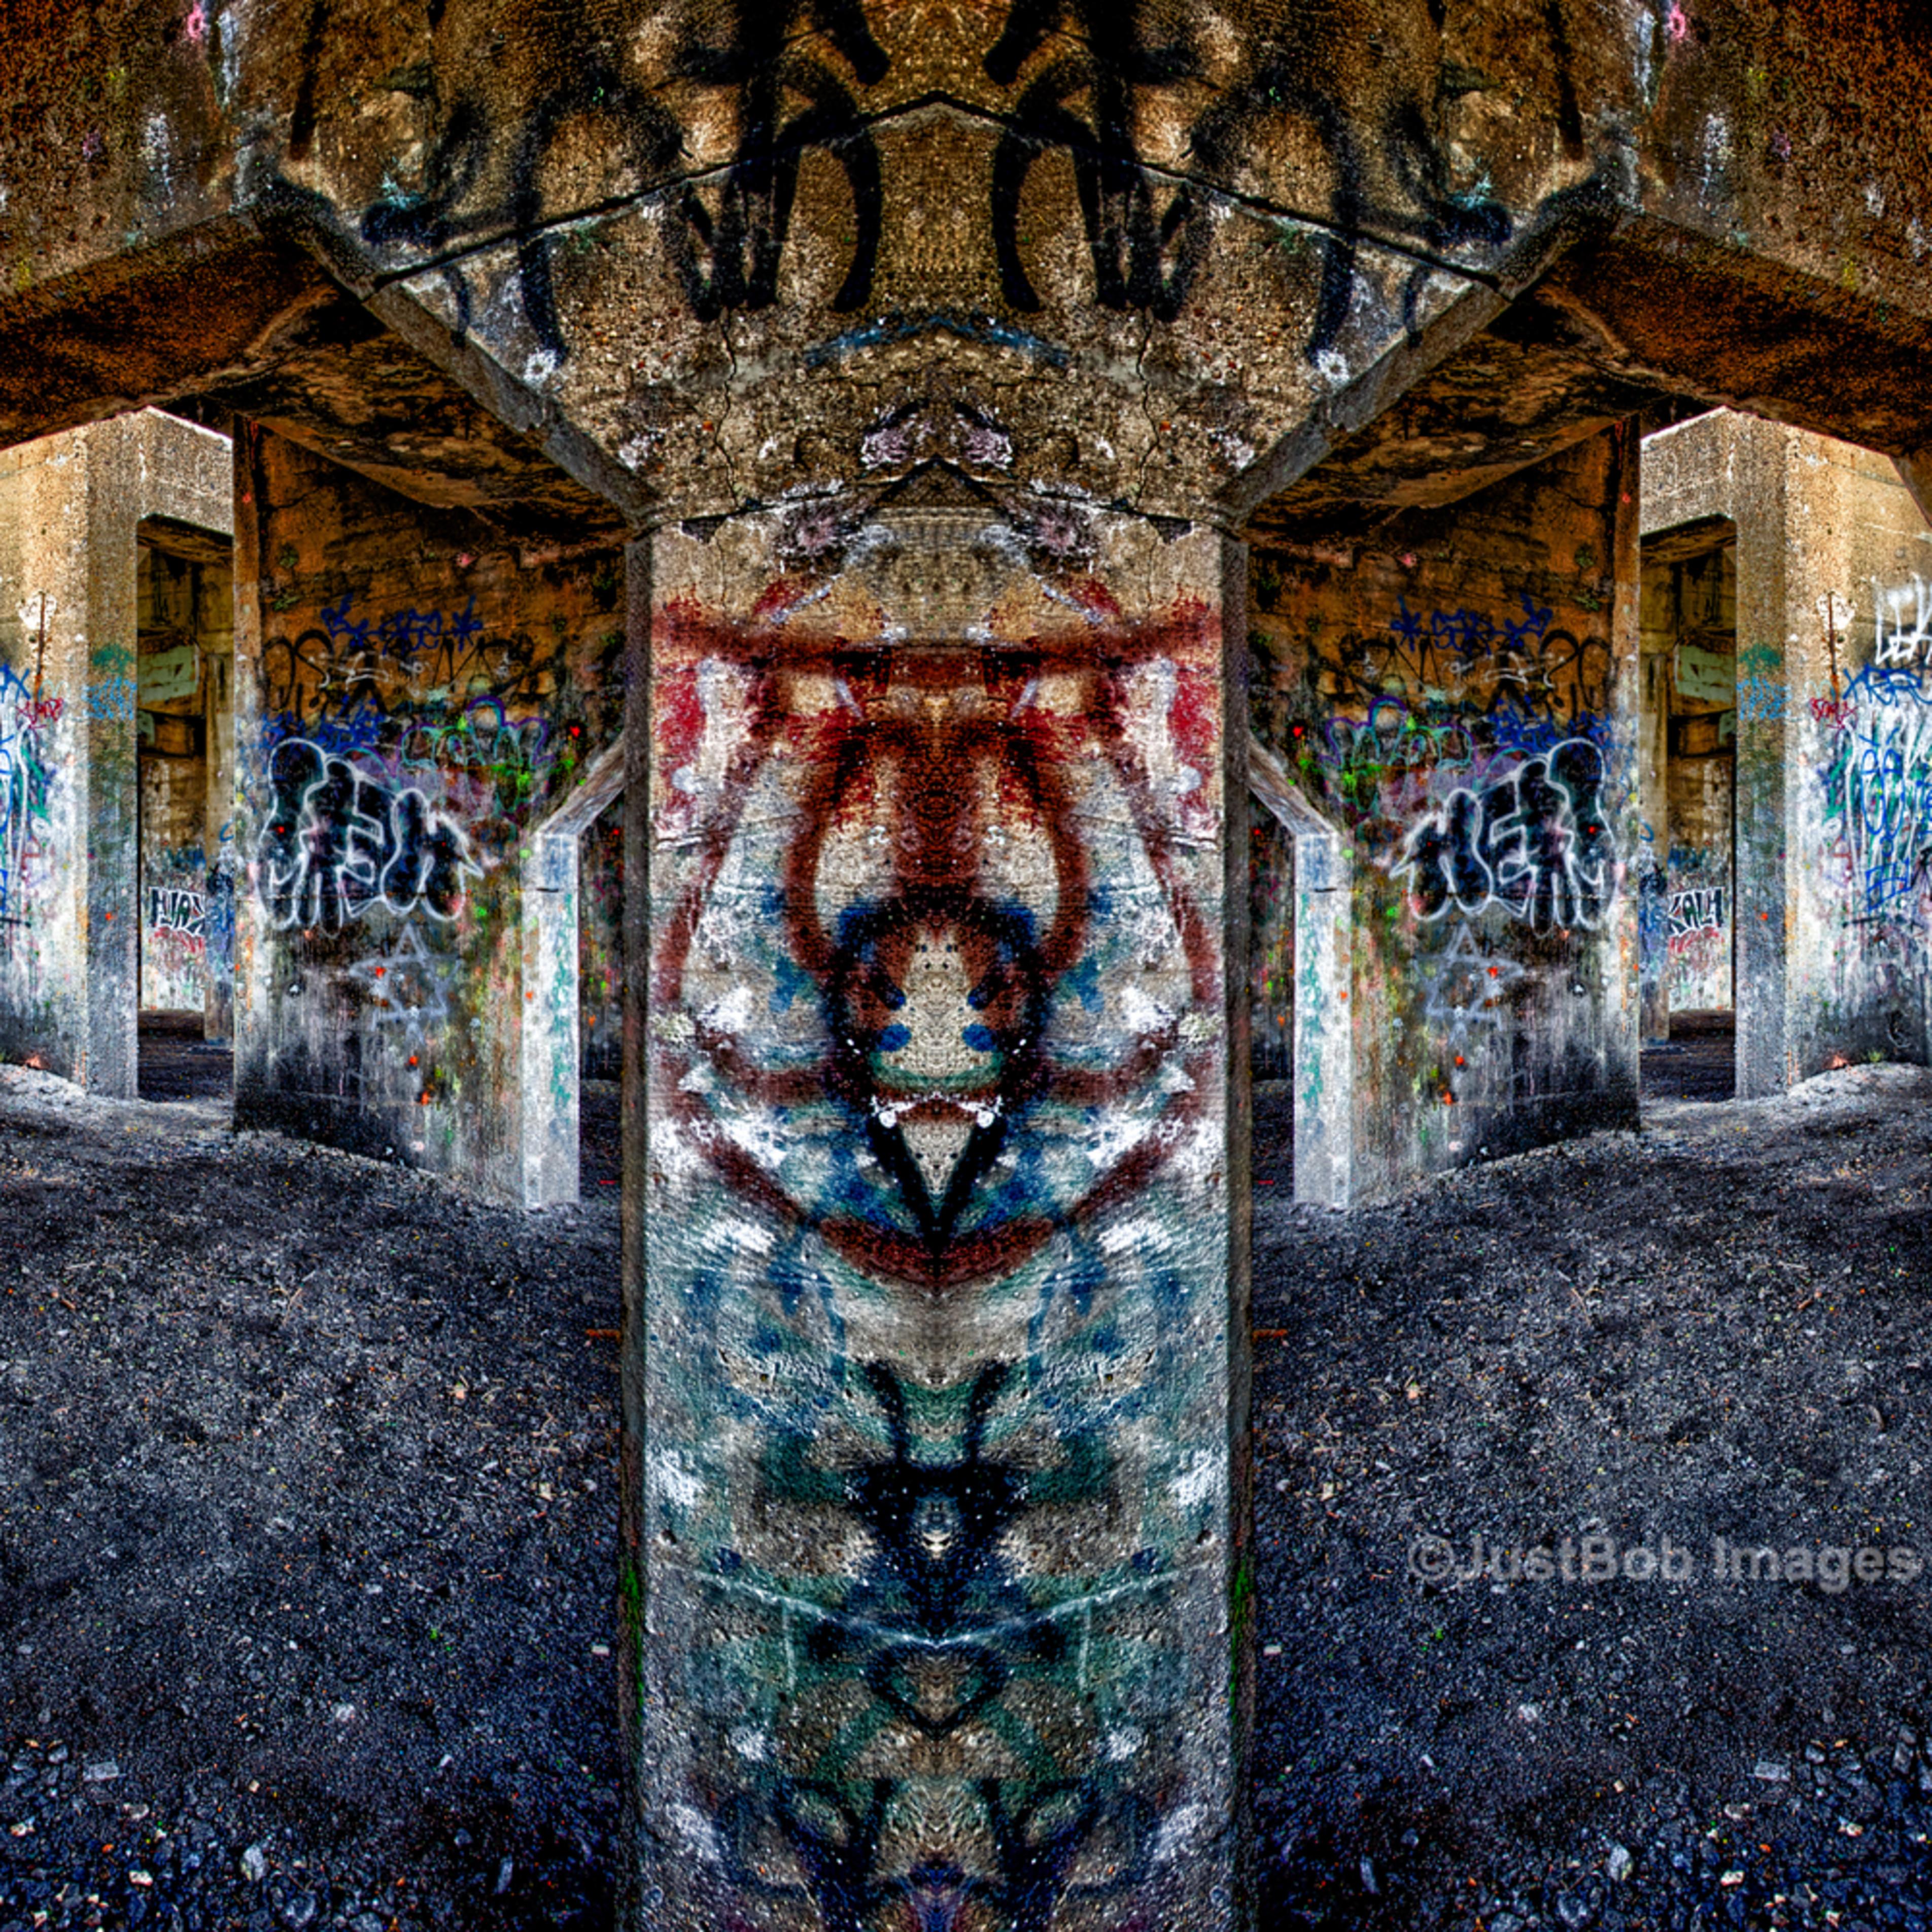 Graffiti 20120214 0182 hdr 1 aipc7p